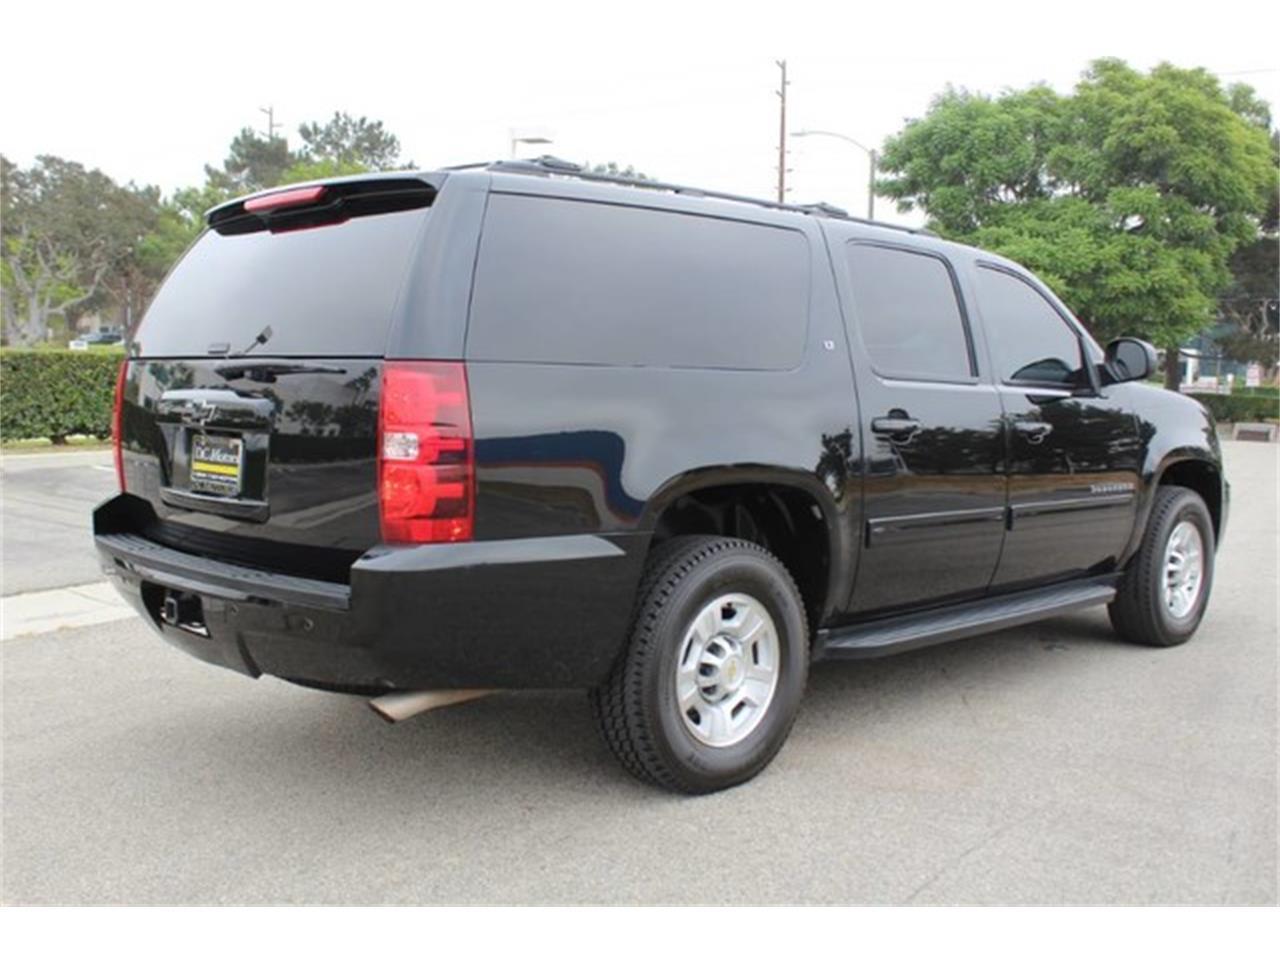 2011 Chevrolet Suburban (CC-1394223) for sale in Anaheim, California